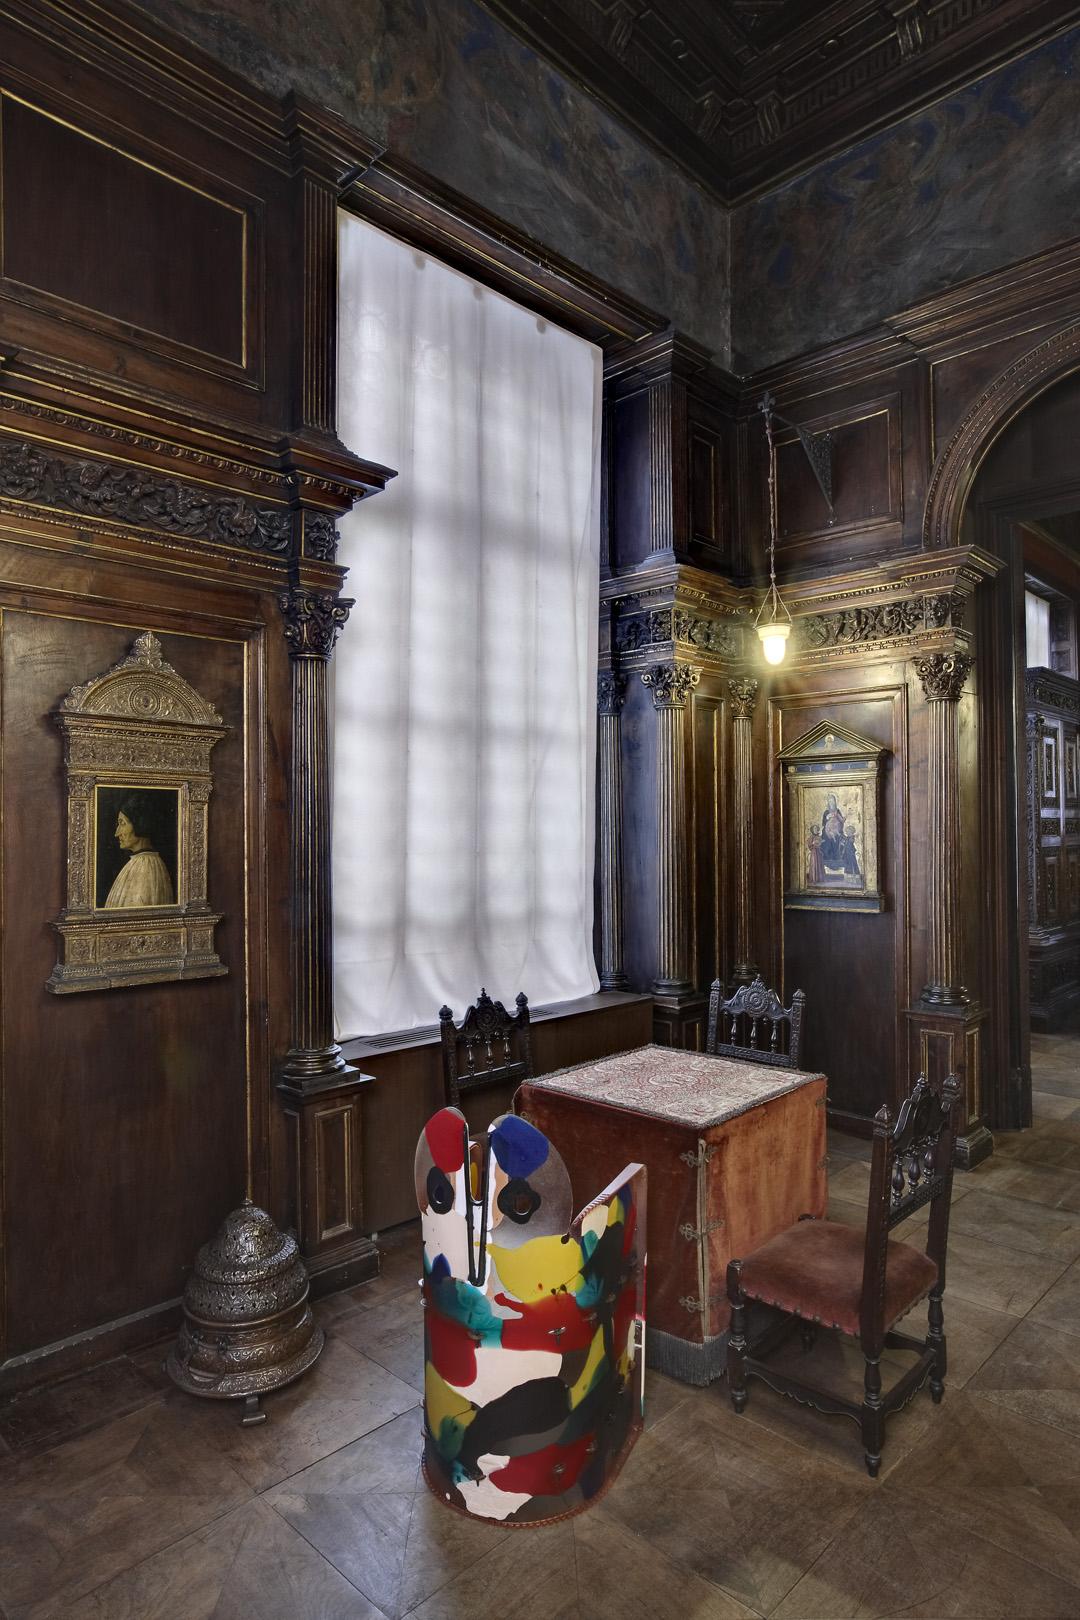 https://www.pasqualeformisano.com/wp-content/uploads/2016/11/Museo_Bagatti_Valsecchi_05.jpg